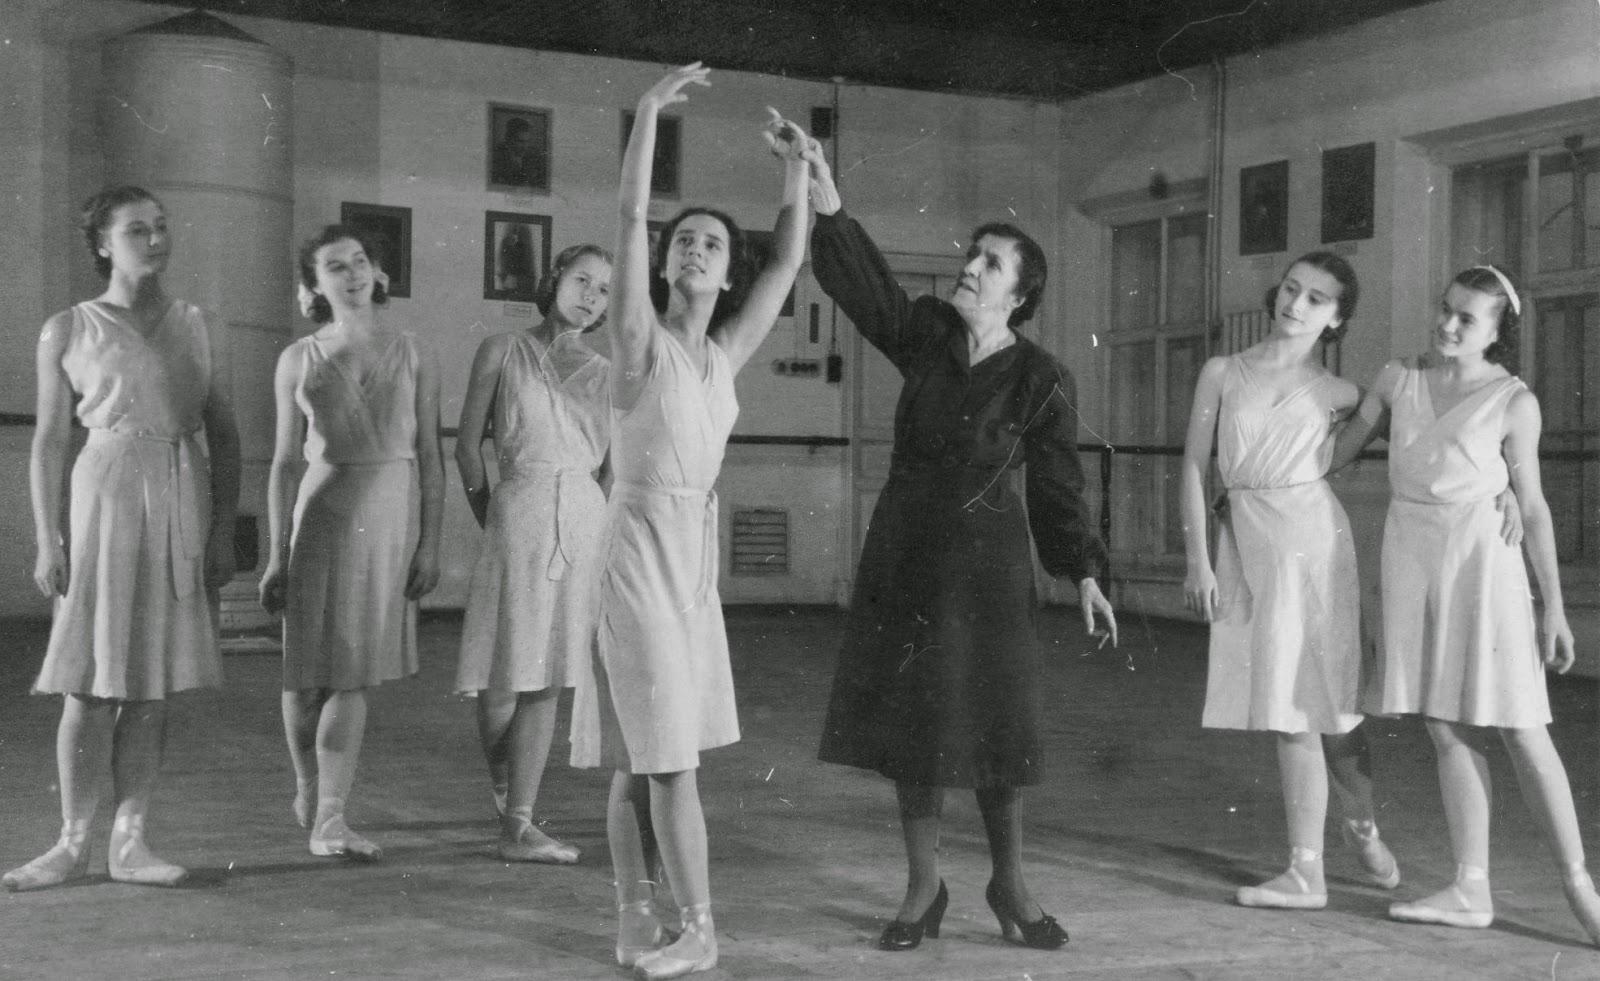 Agrippina Vaganova Technique Agrippina Vaganova Teaching in